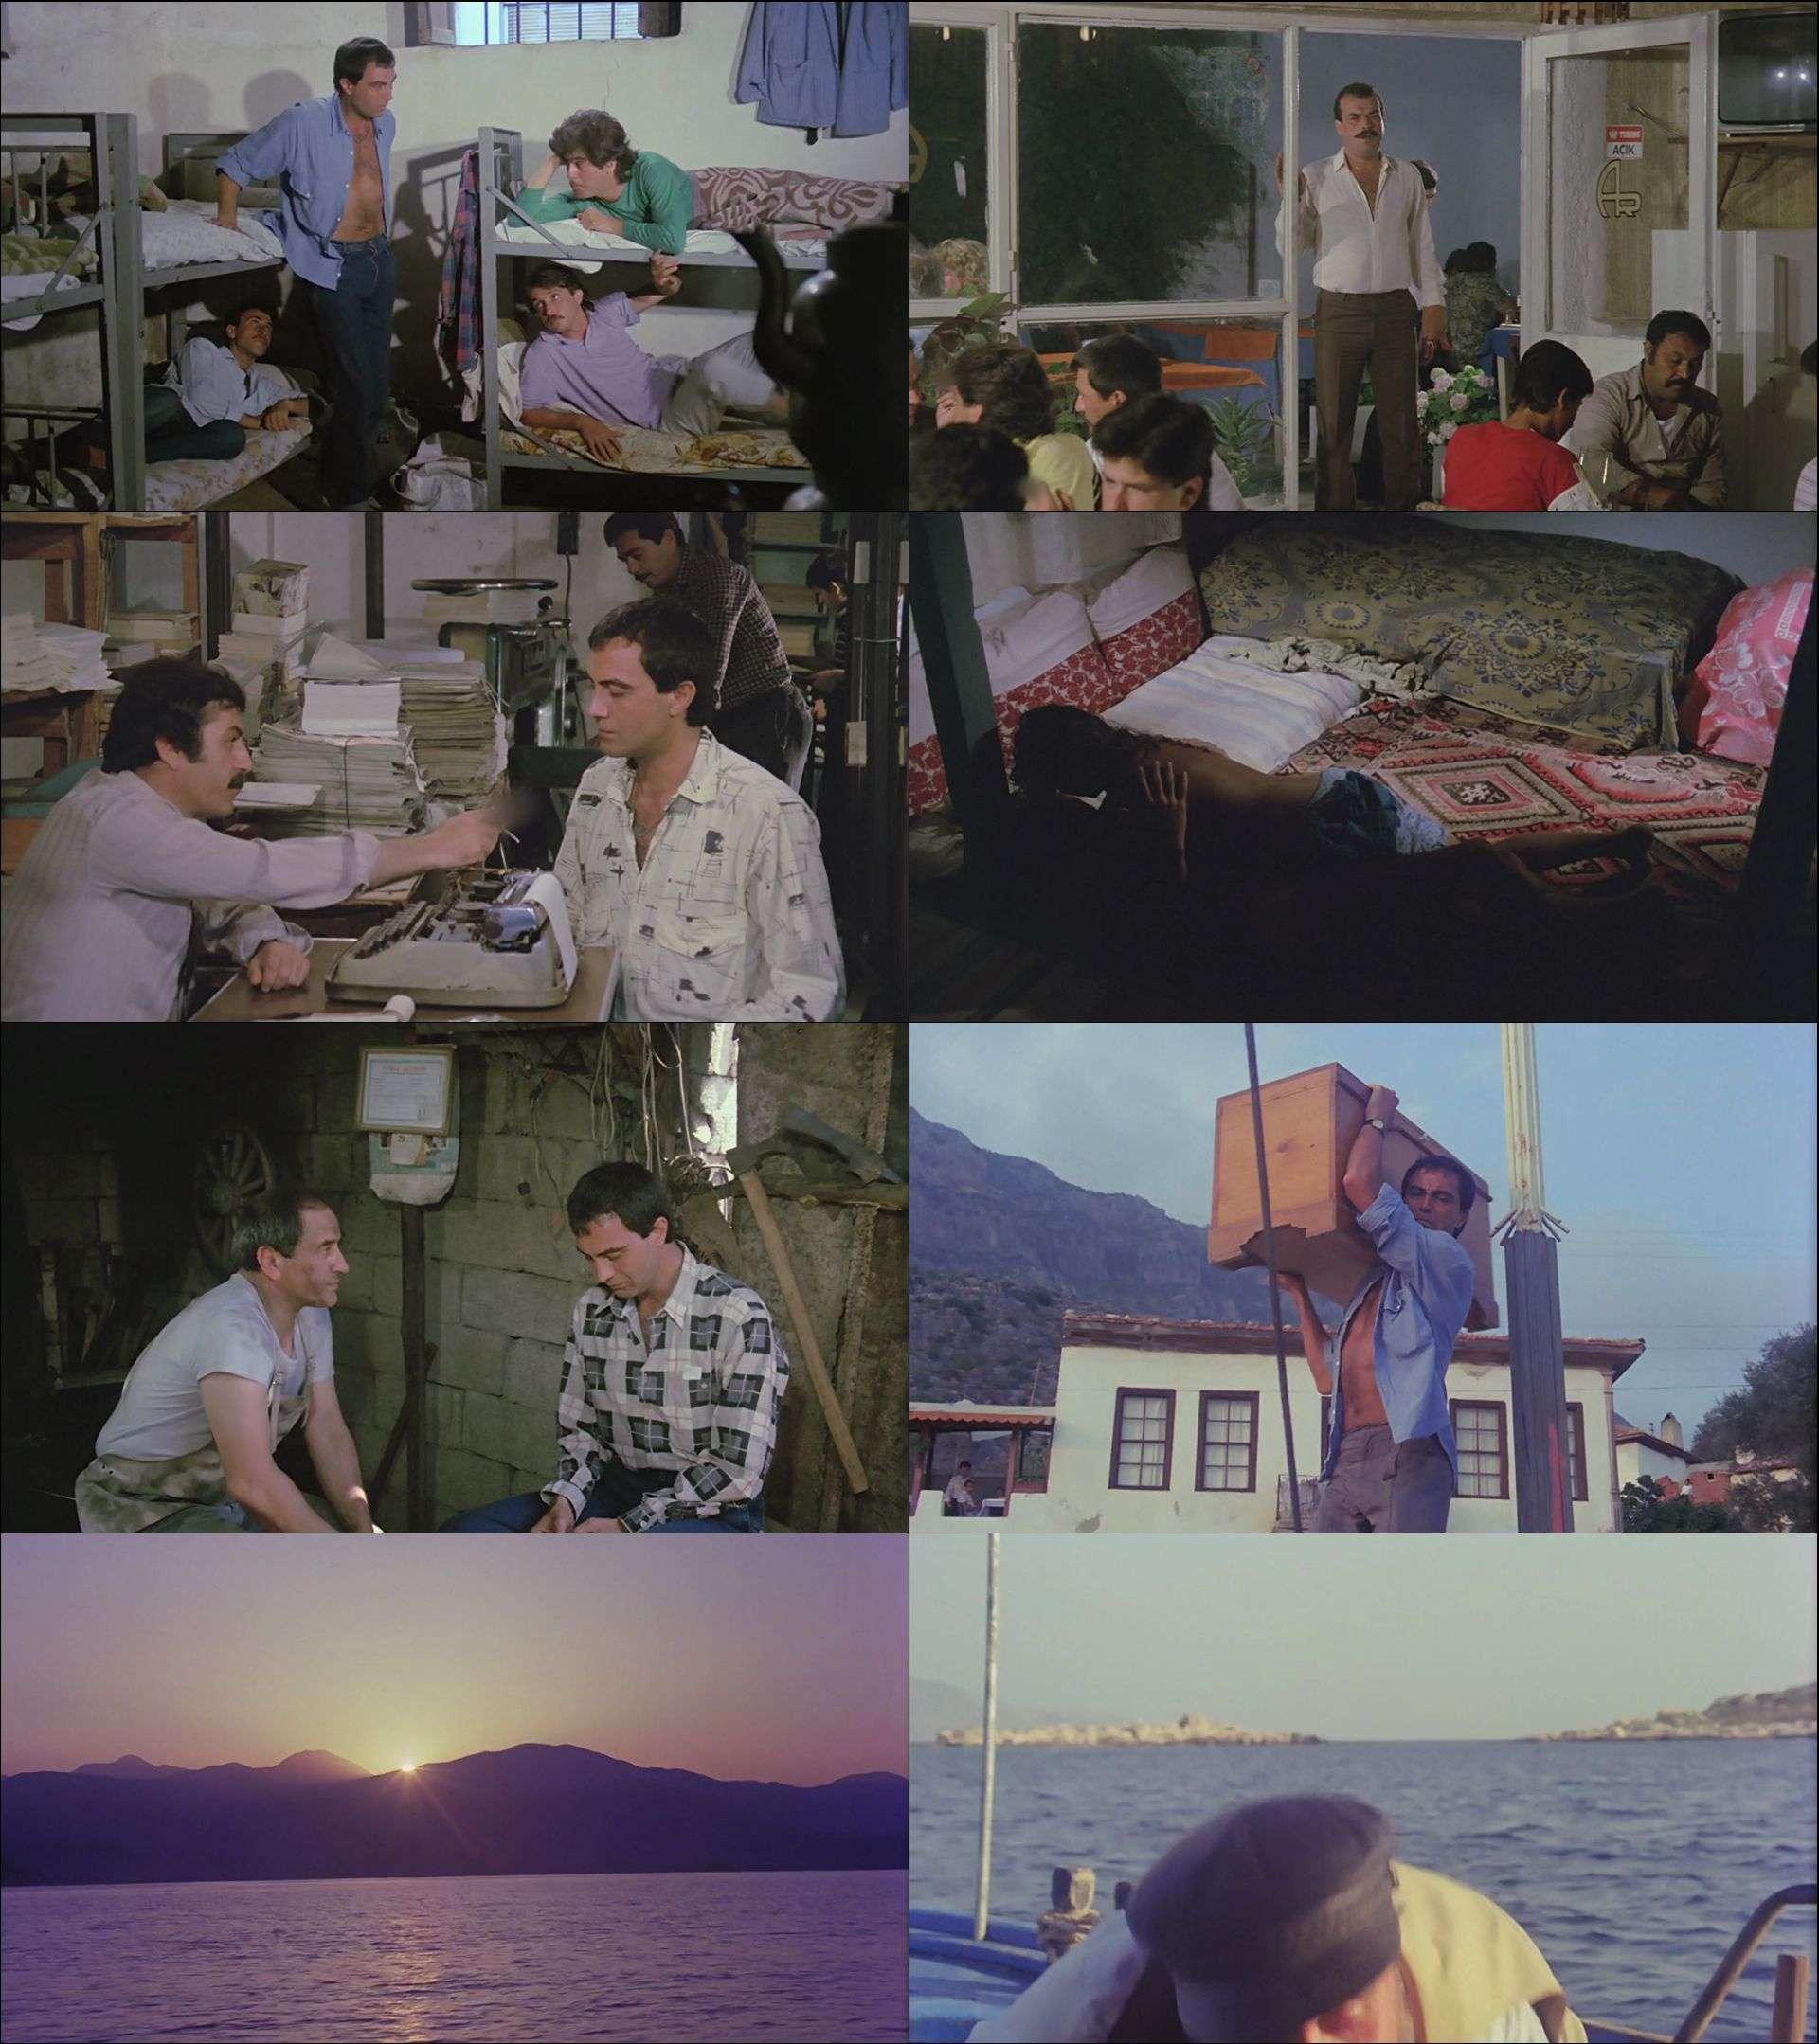 Fatmagül'ün suçu ne (1986) full yerli film indir